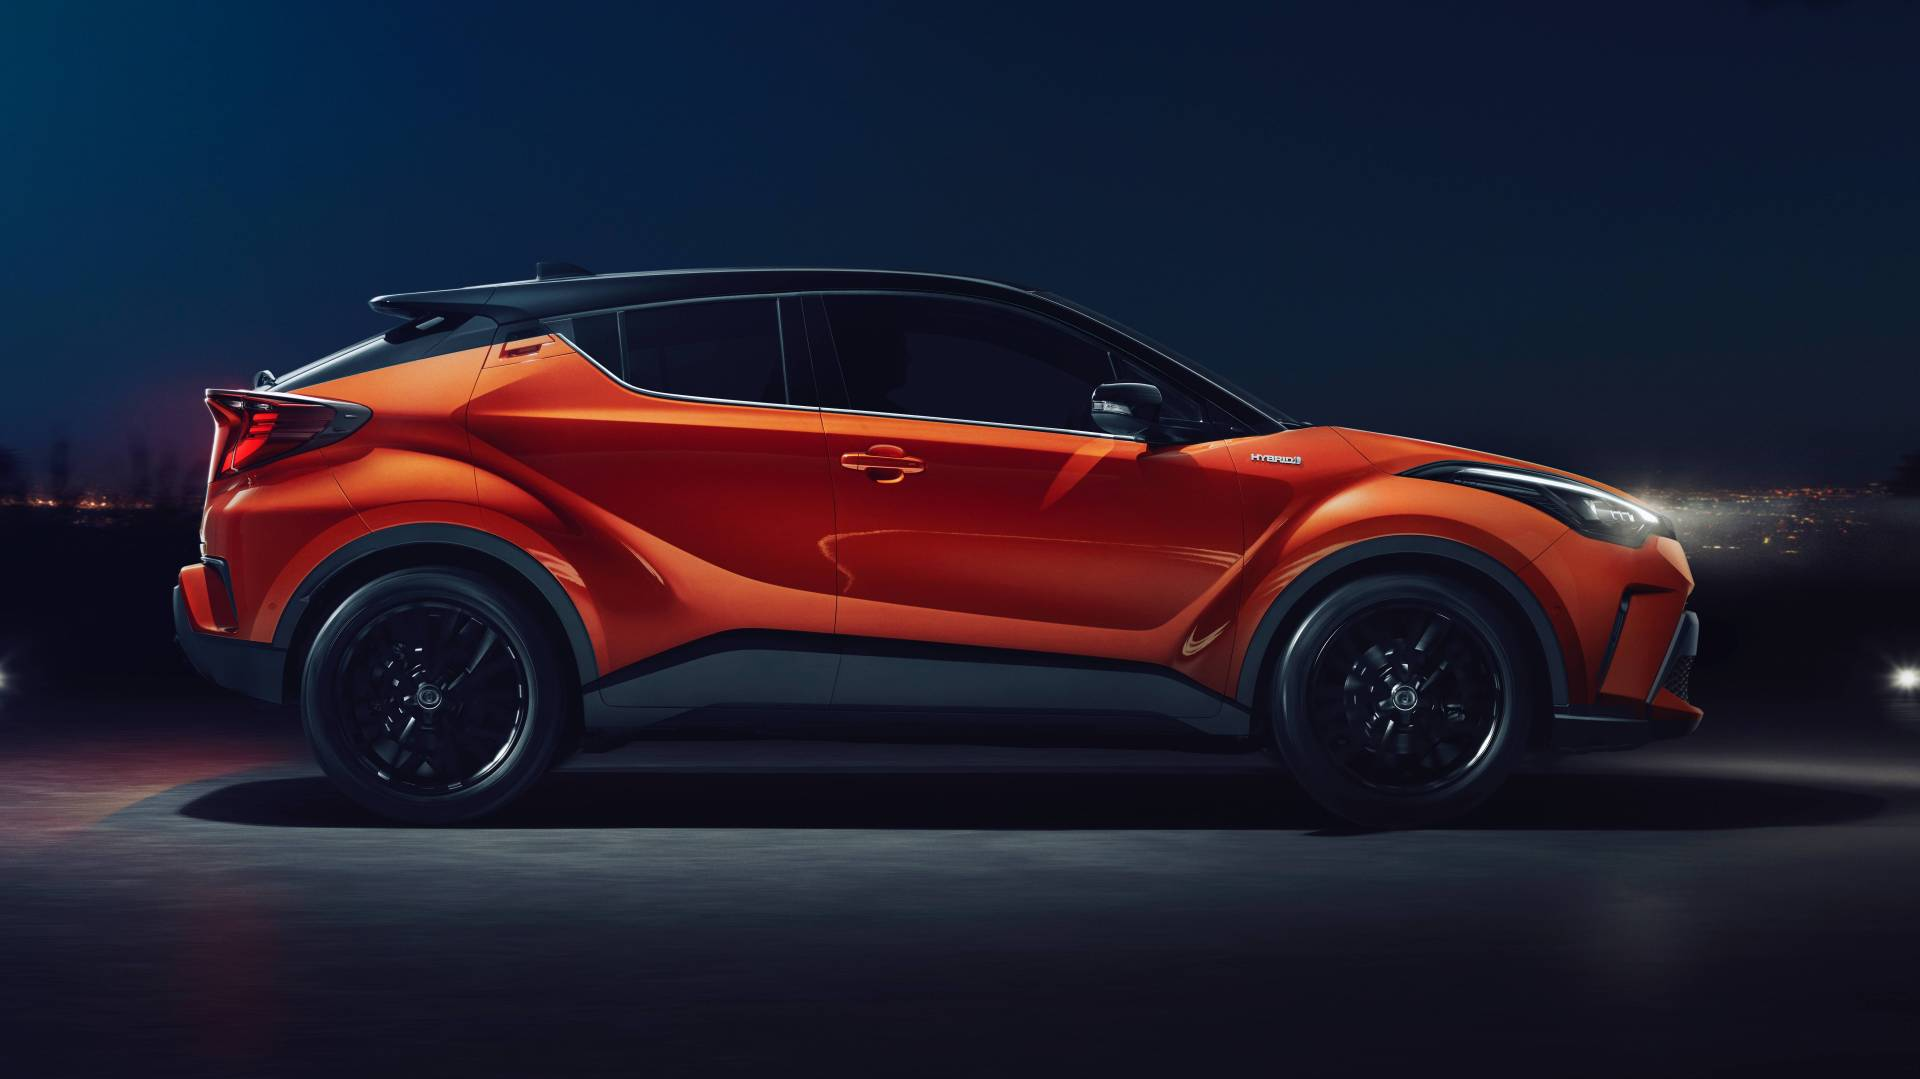 фото Toyota C-НR 2020 сбоку